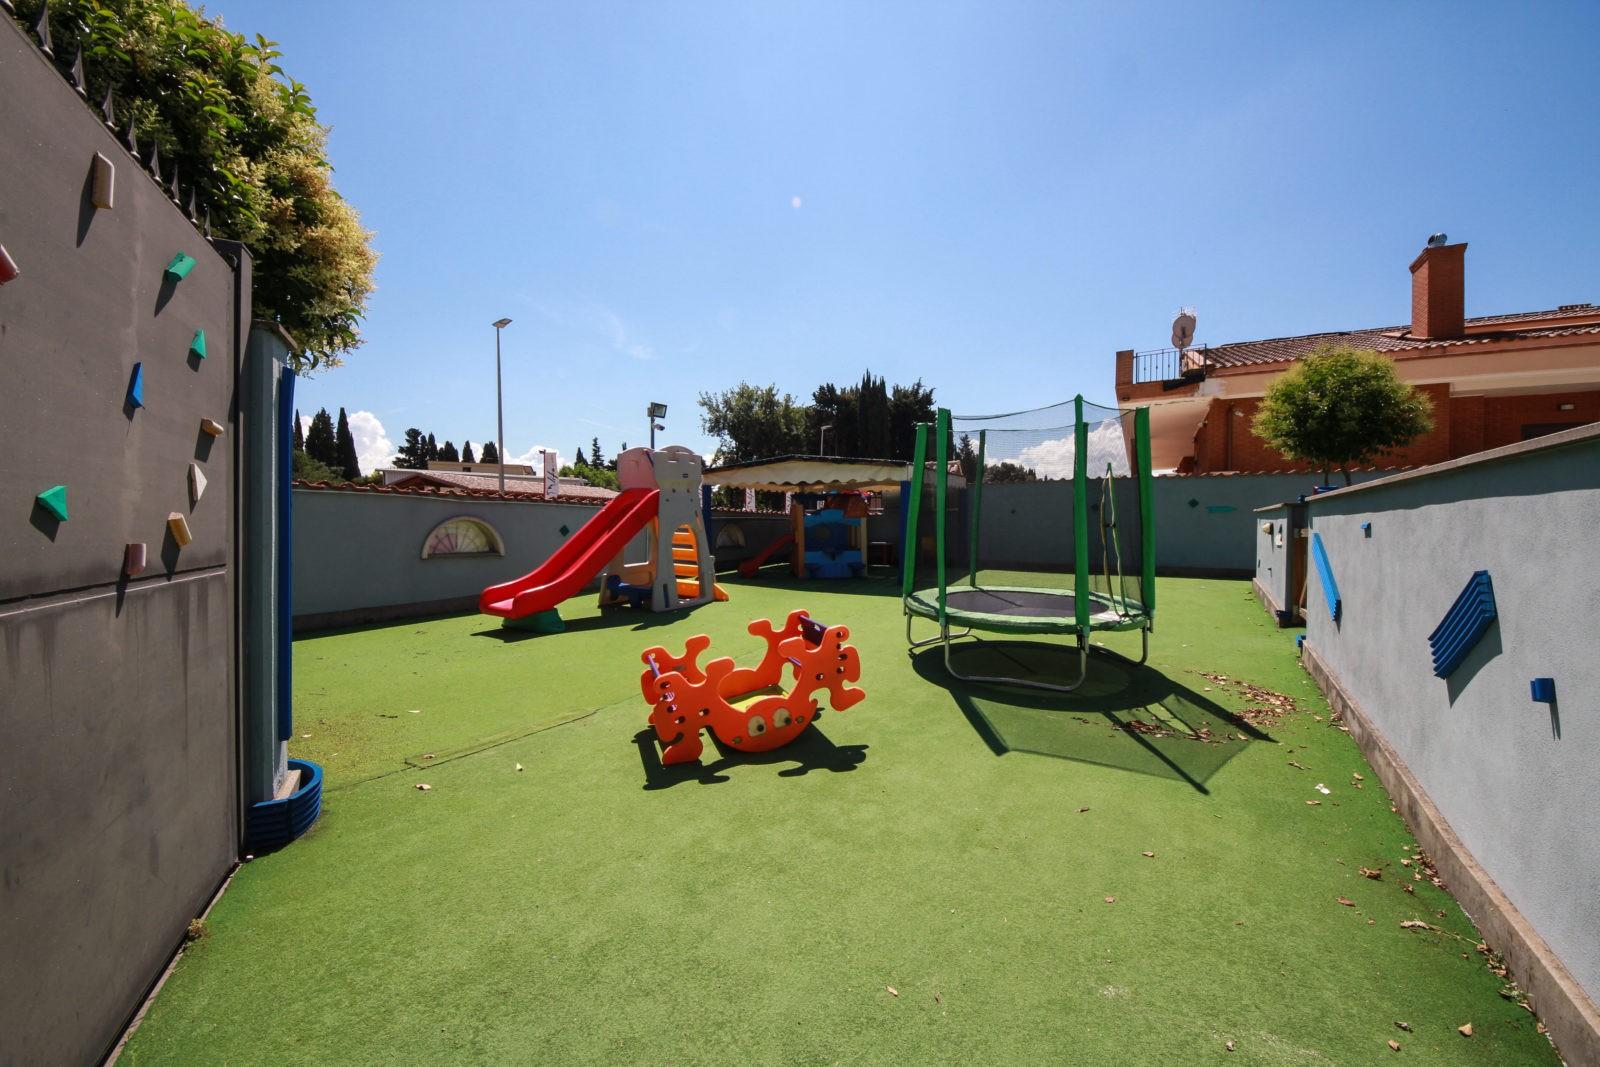 Scuola Maria Montessori - Giardino